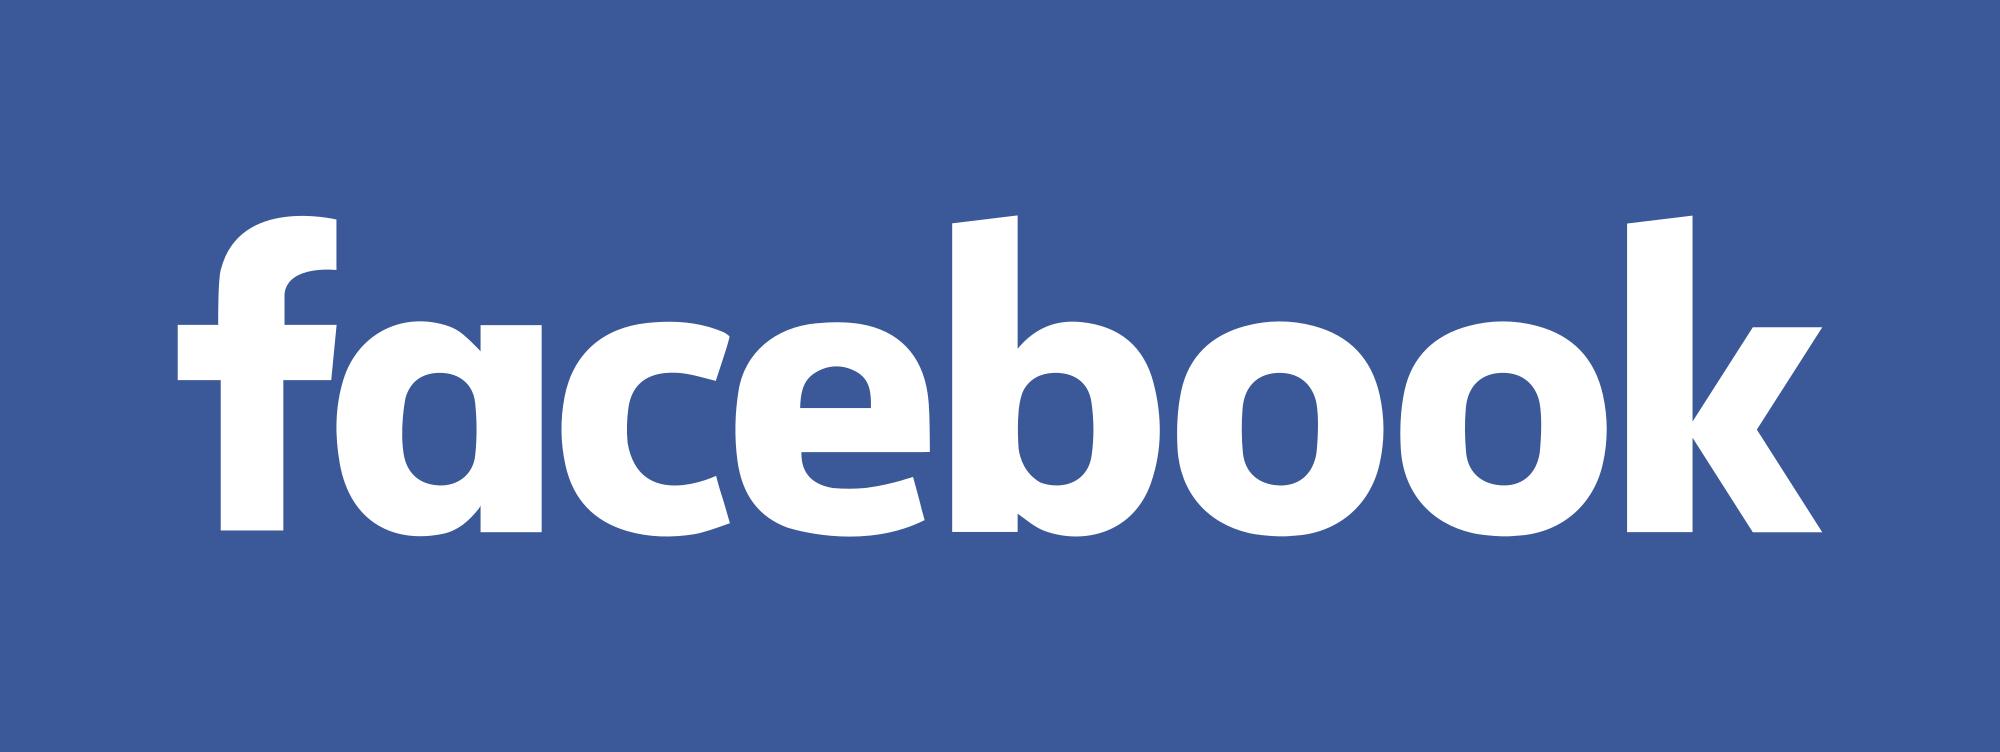 facebook tennison long american writer